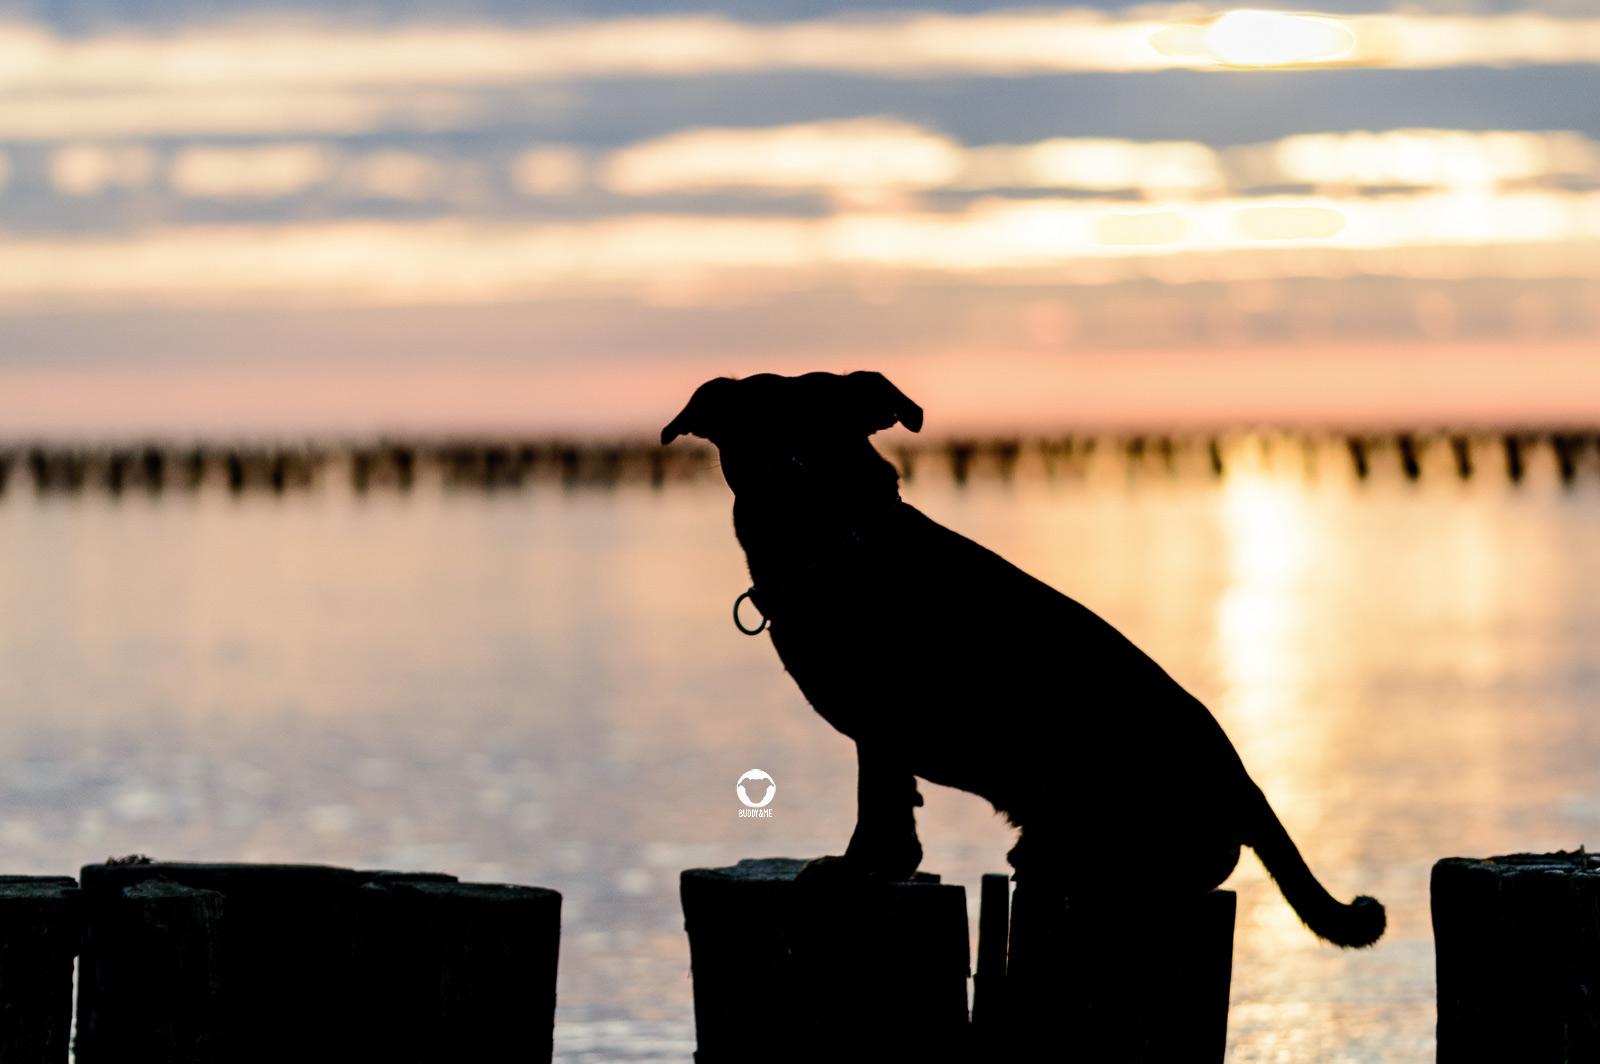 Pinscher Buddy, Buddy and Me, Hundeblog, Dogblog, Hundeurlaub, Darß, Zingst, Ostsee, Urlaub, September, Spätsommer, Strand, Meer, Natur, Erholung, Ruhe, Achtern Diek, Reetdachhaus, Ferienwohnung mit Hund, Hundefotografie